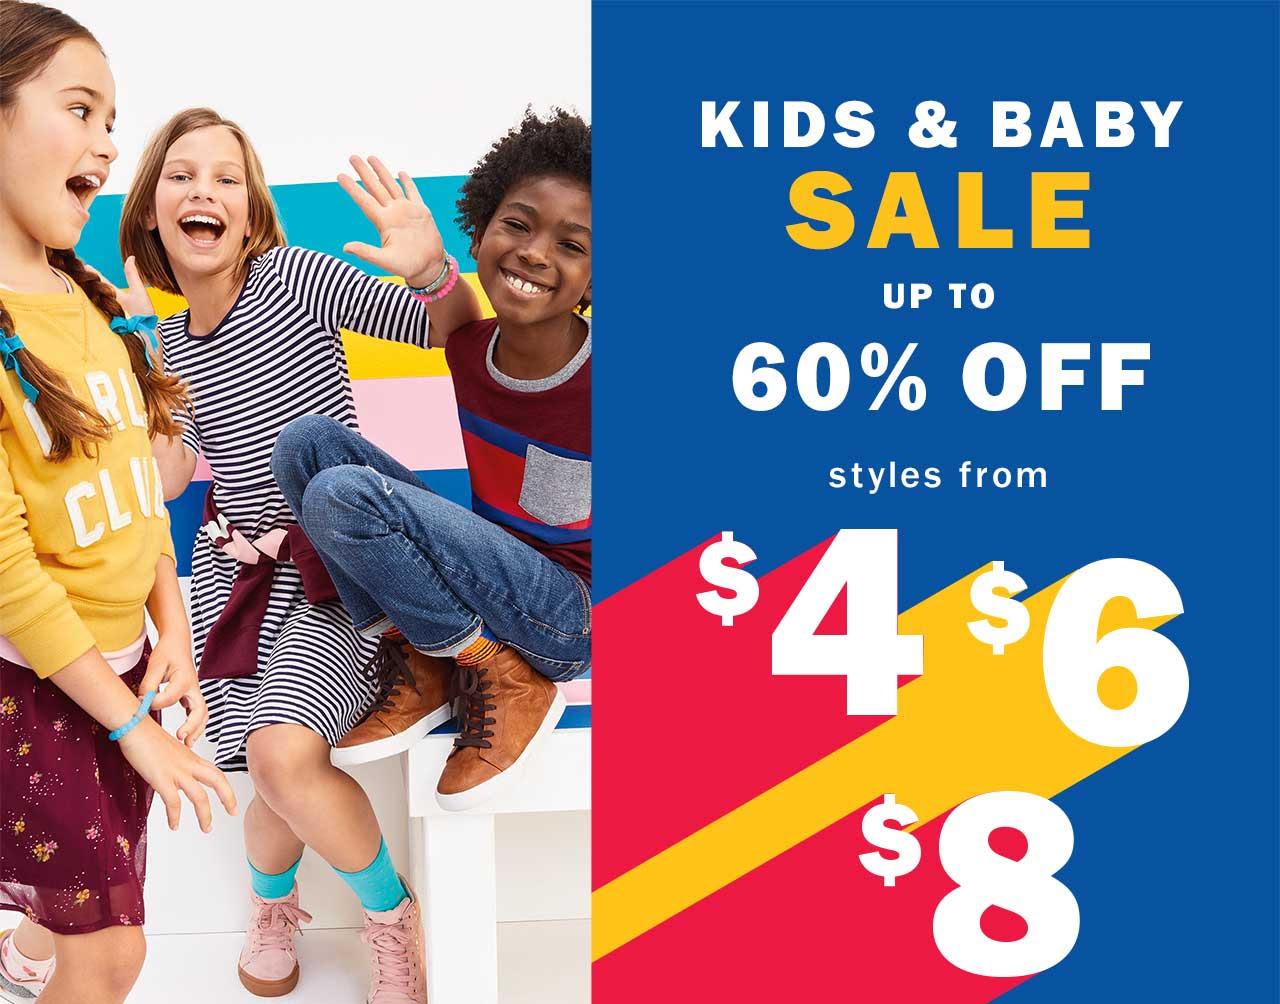 Kids & baby sale